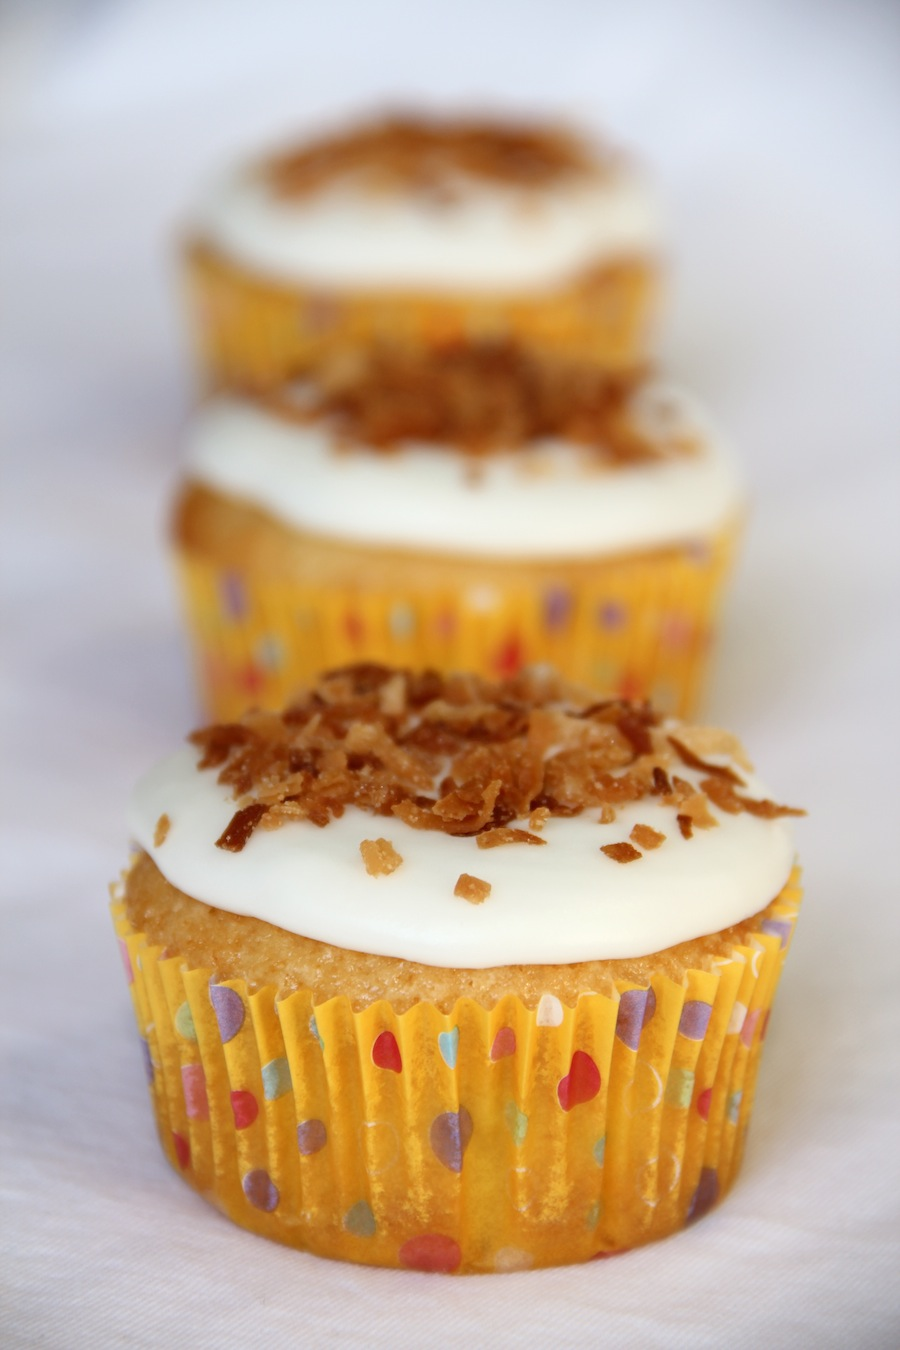 lemon-German chocolate combo cupcakes